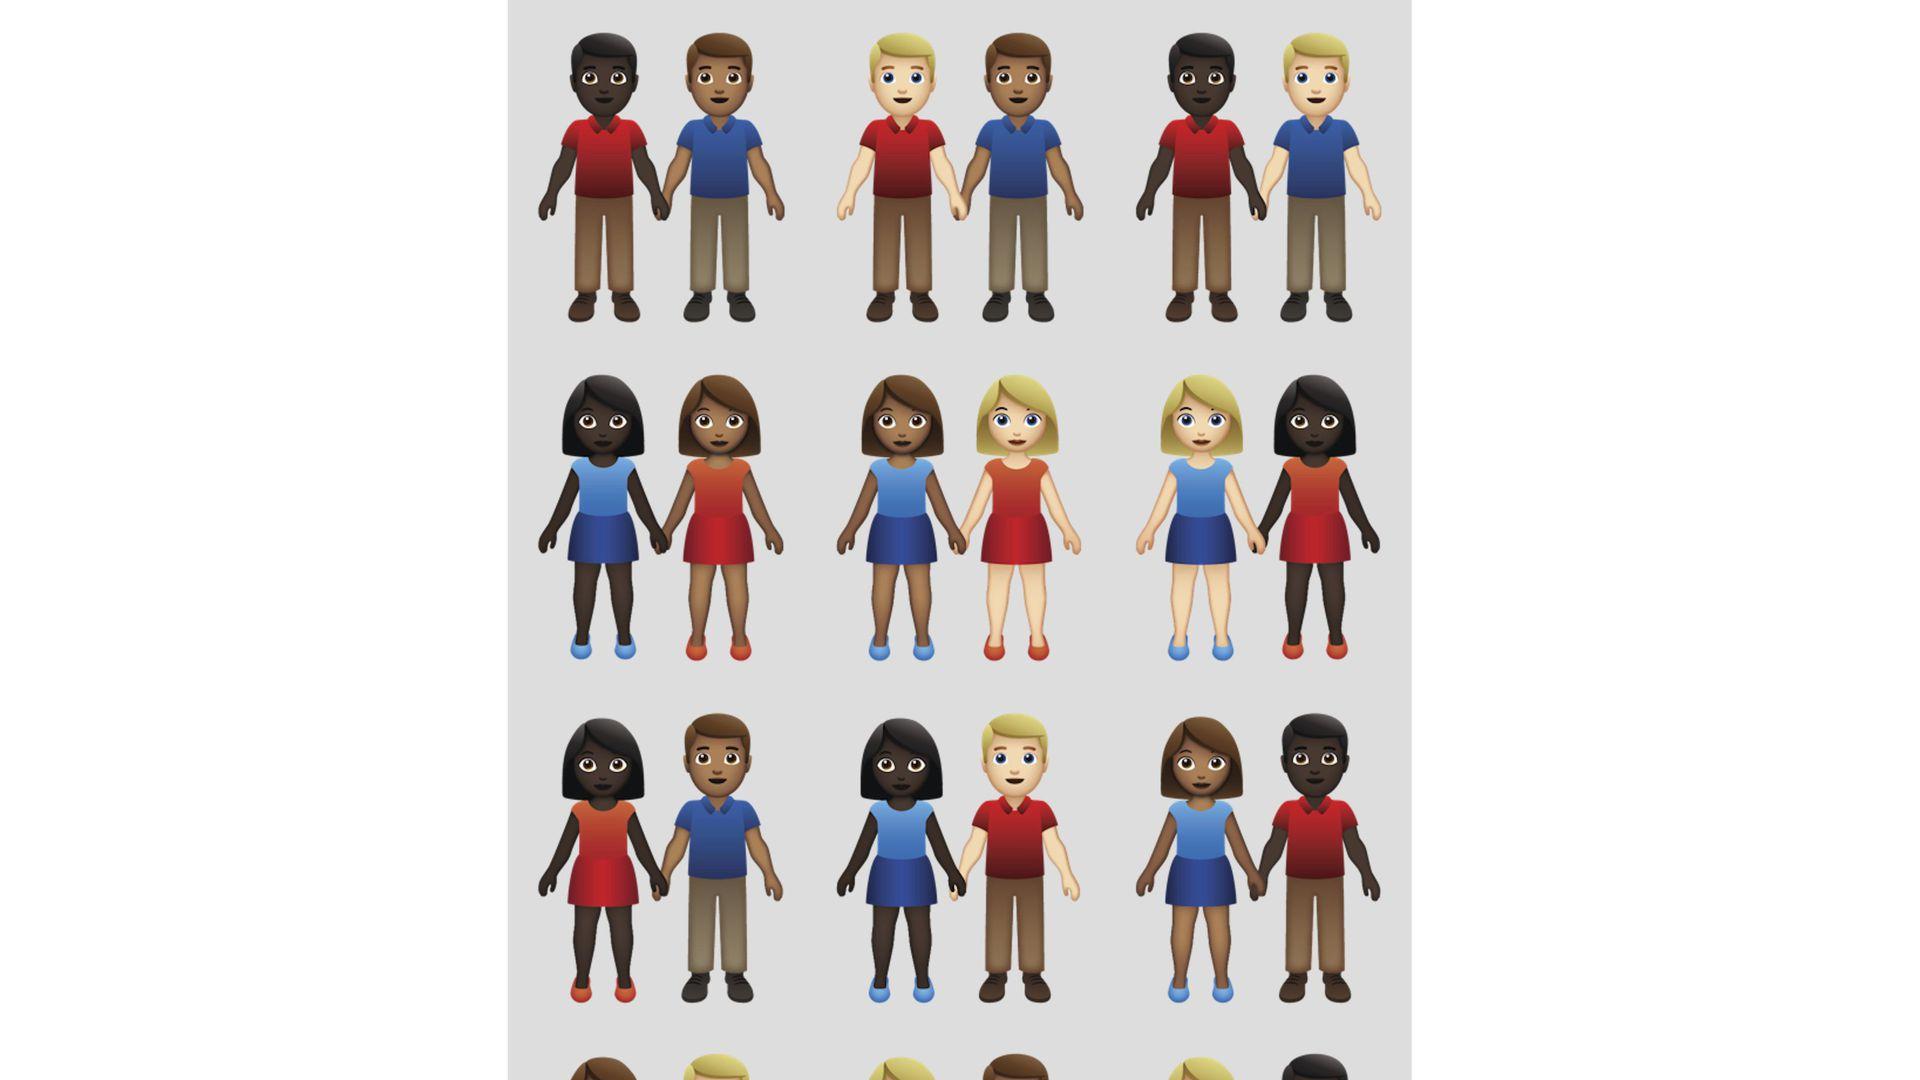 Unicode Consortium approves interracial couple emojis   Axios 1920x1080